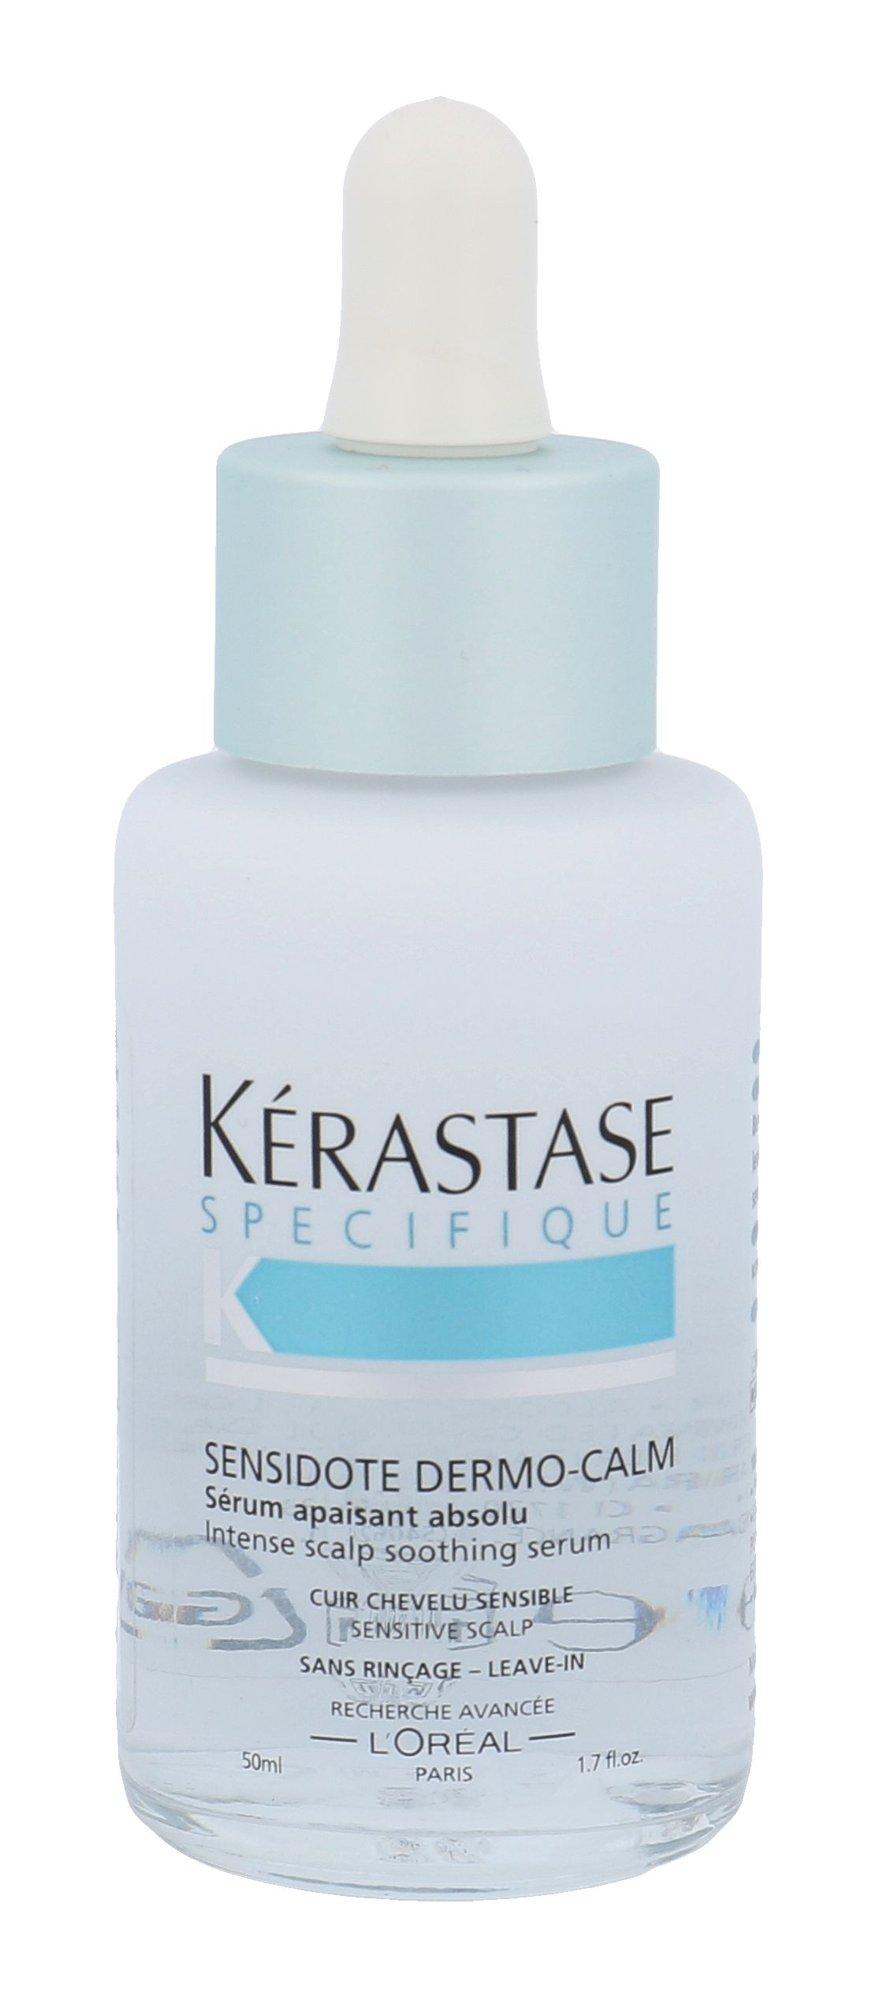 Kérastase Spécifique Cosmetic 50ml